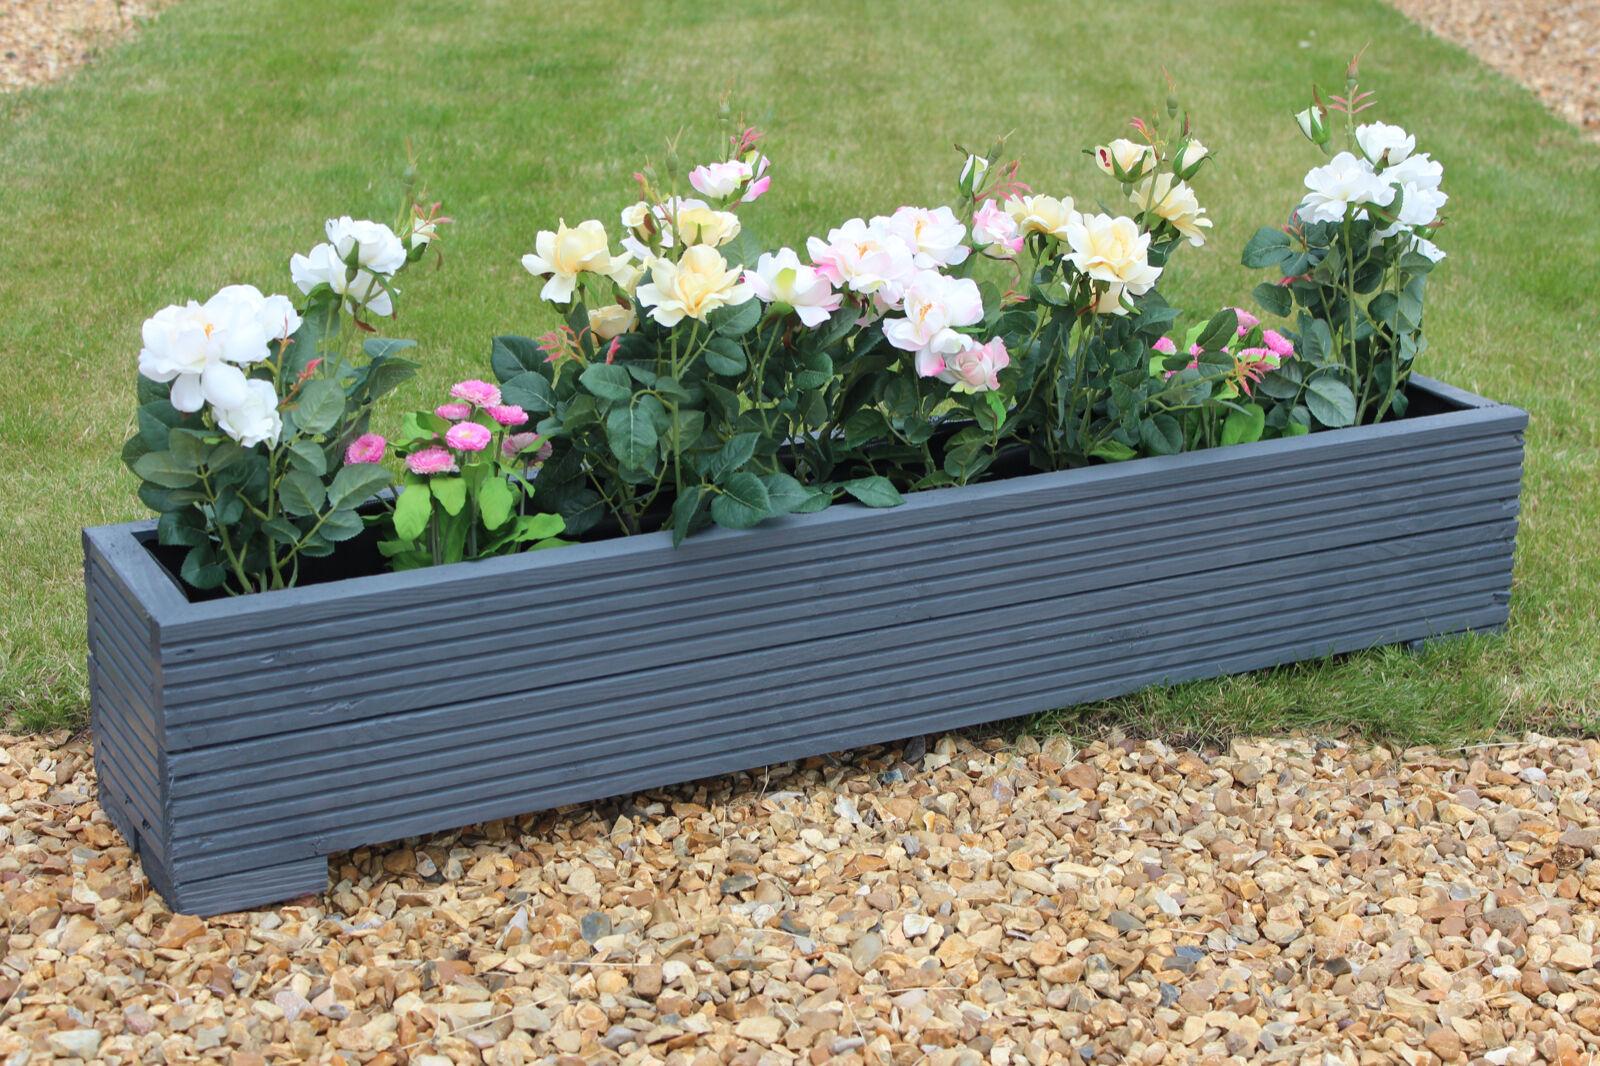 Grey 120x22x23 (cm) WOODEN GARDEN PLANTER TROUGH / PLANT POT